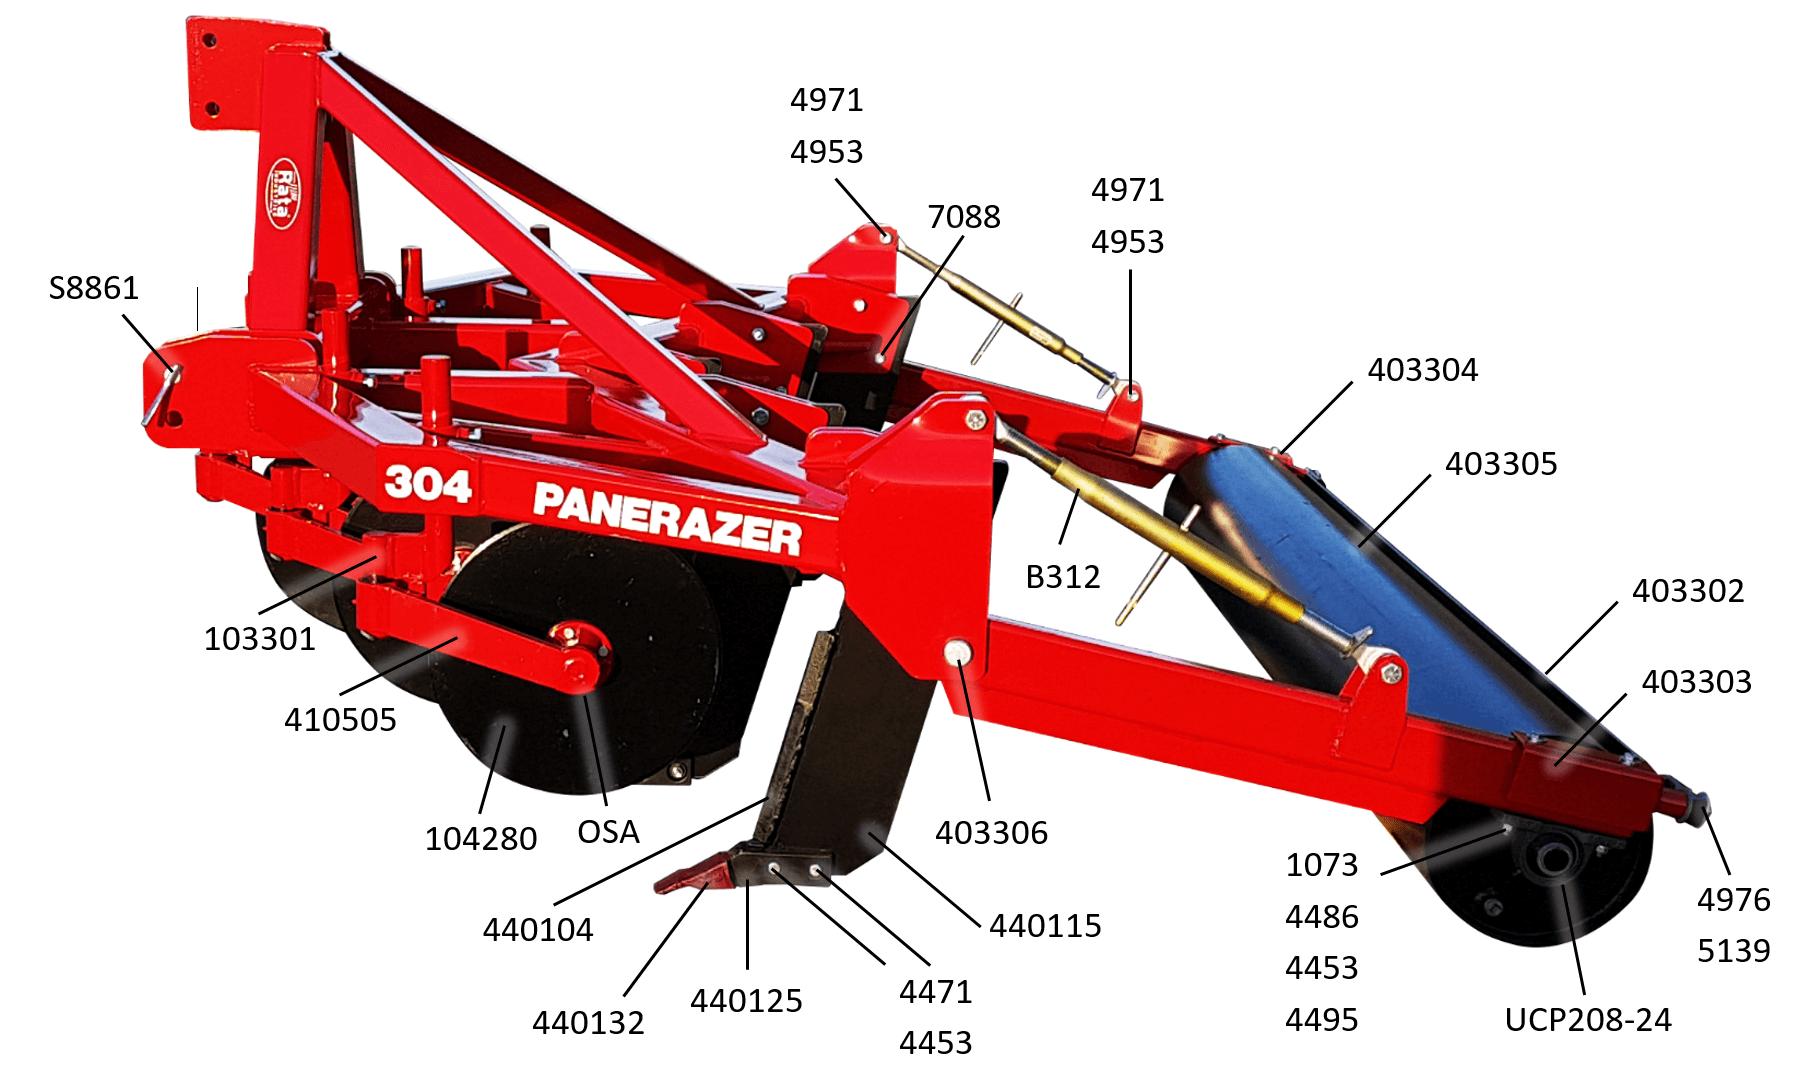 304P5 Parts Diagram